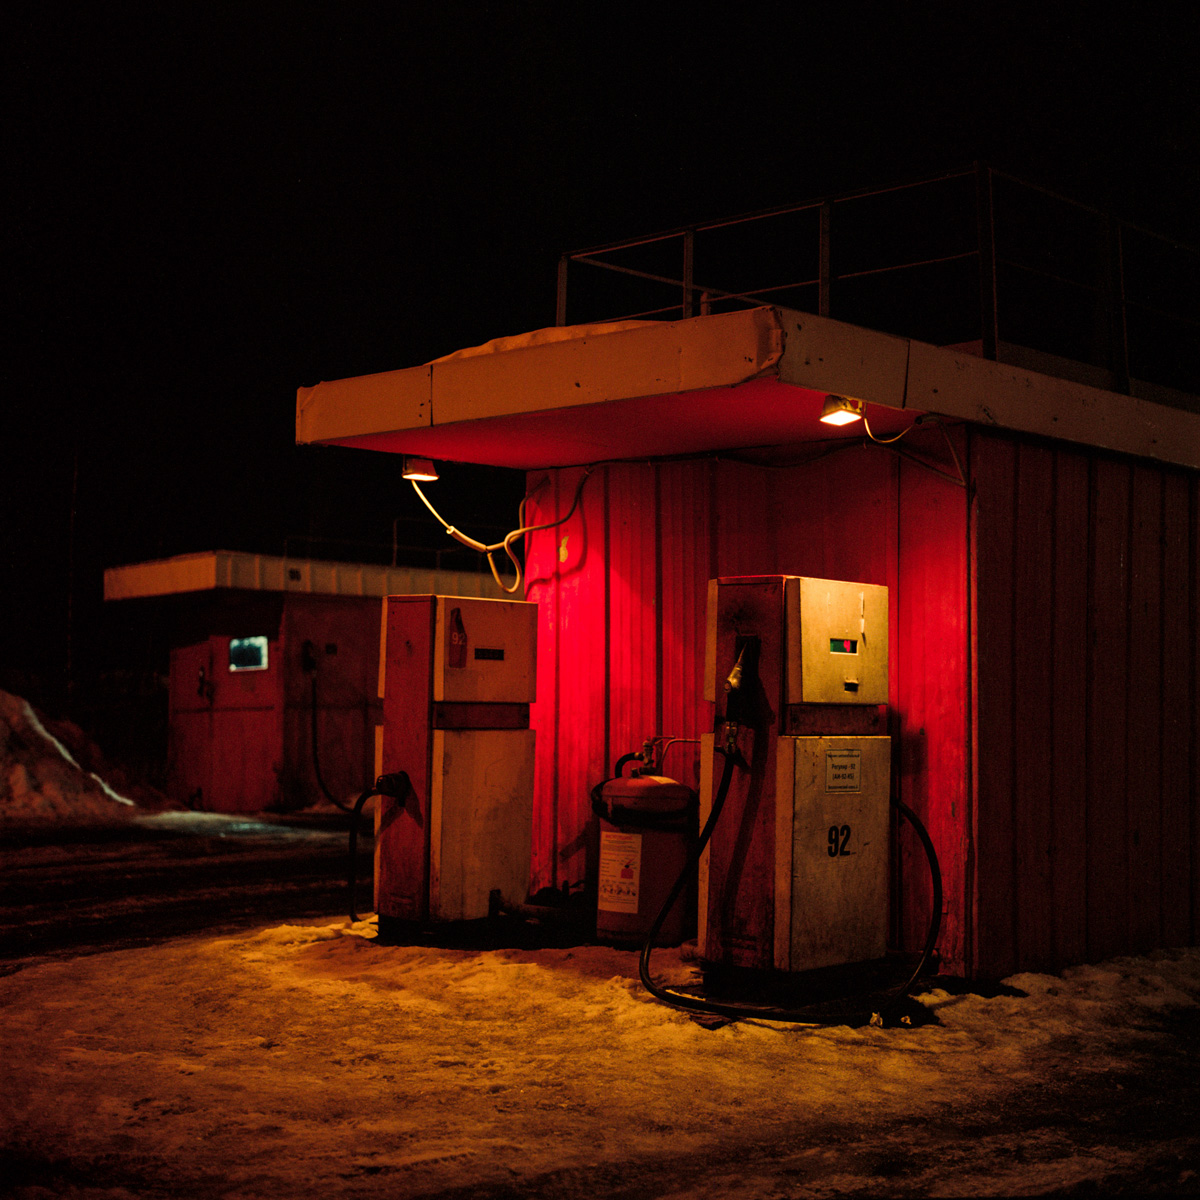 Mikhail Lebedev Snow Desert C41magazine Photography 11